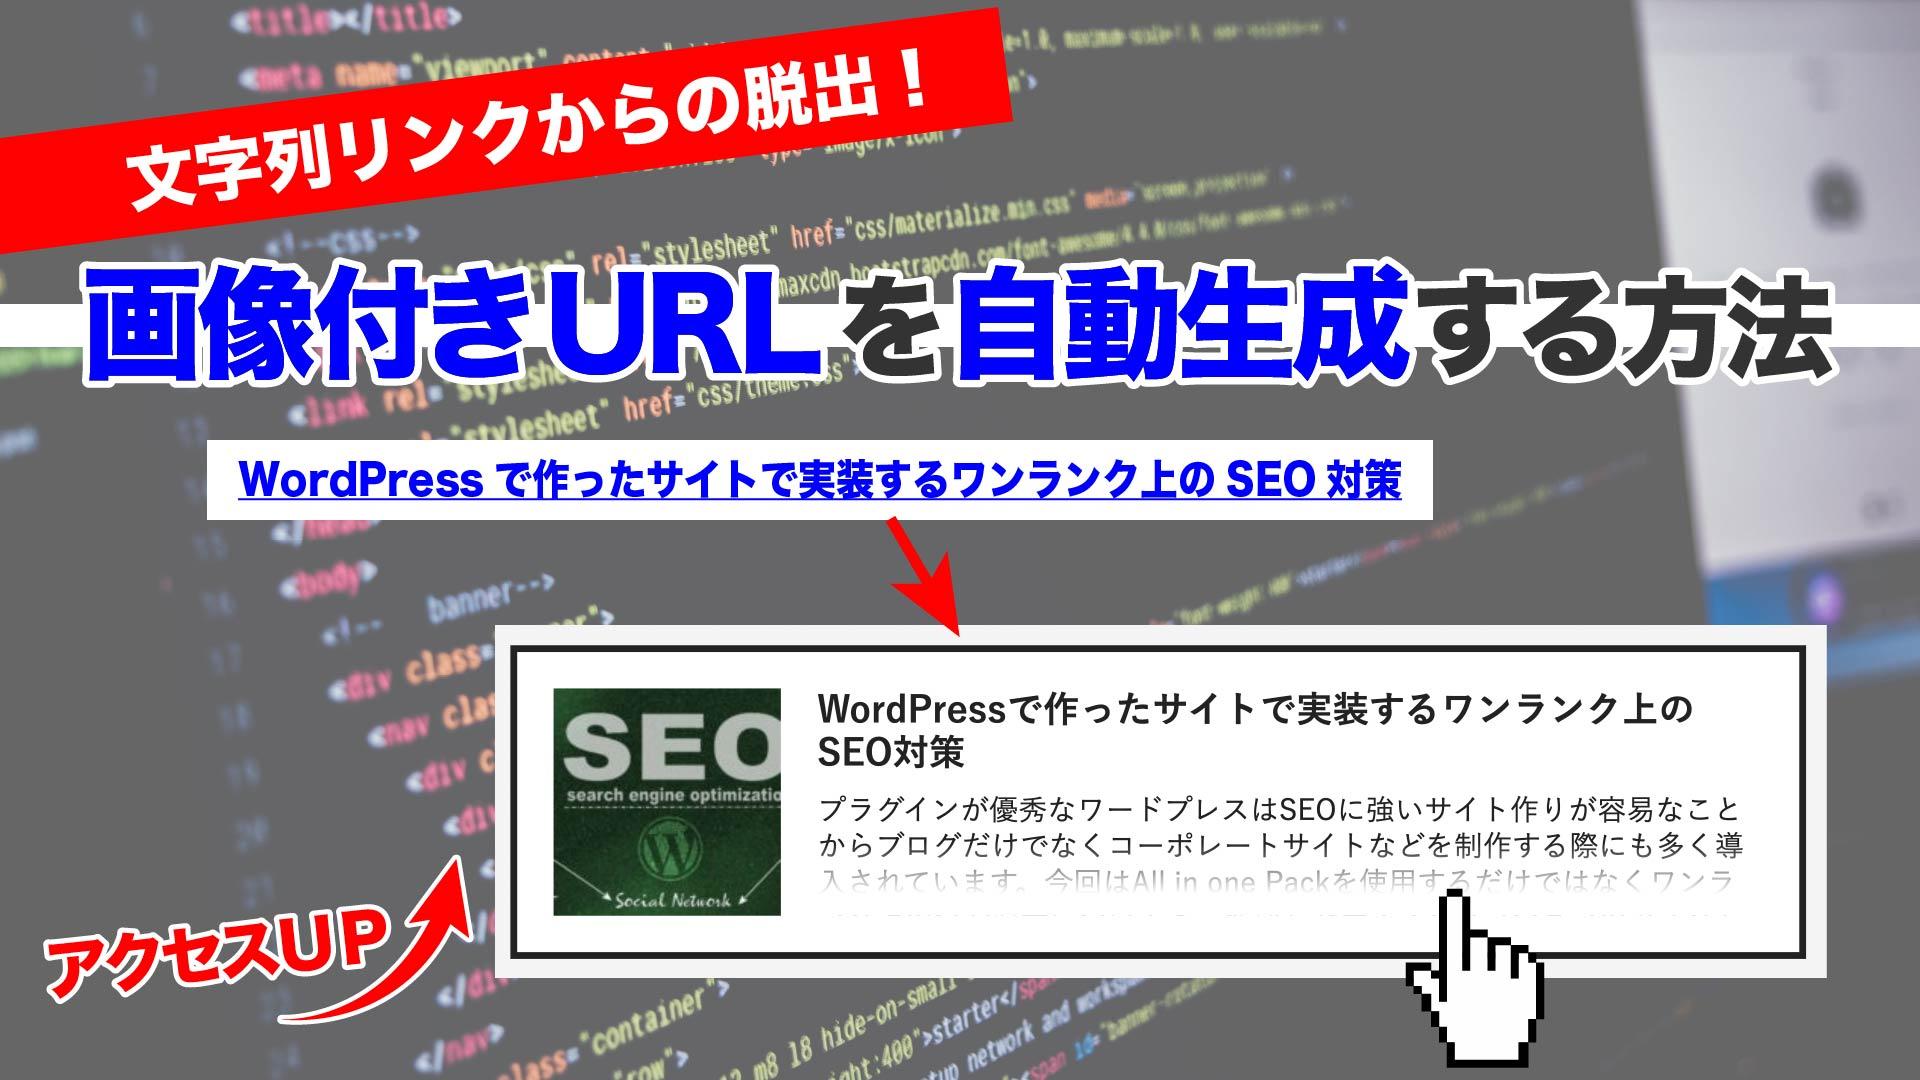 SNS拡散力アップ!PHPでOG画像付きリッチURLを自作する方法【Curl → Opengraph】